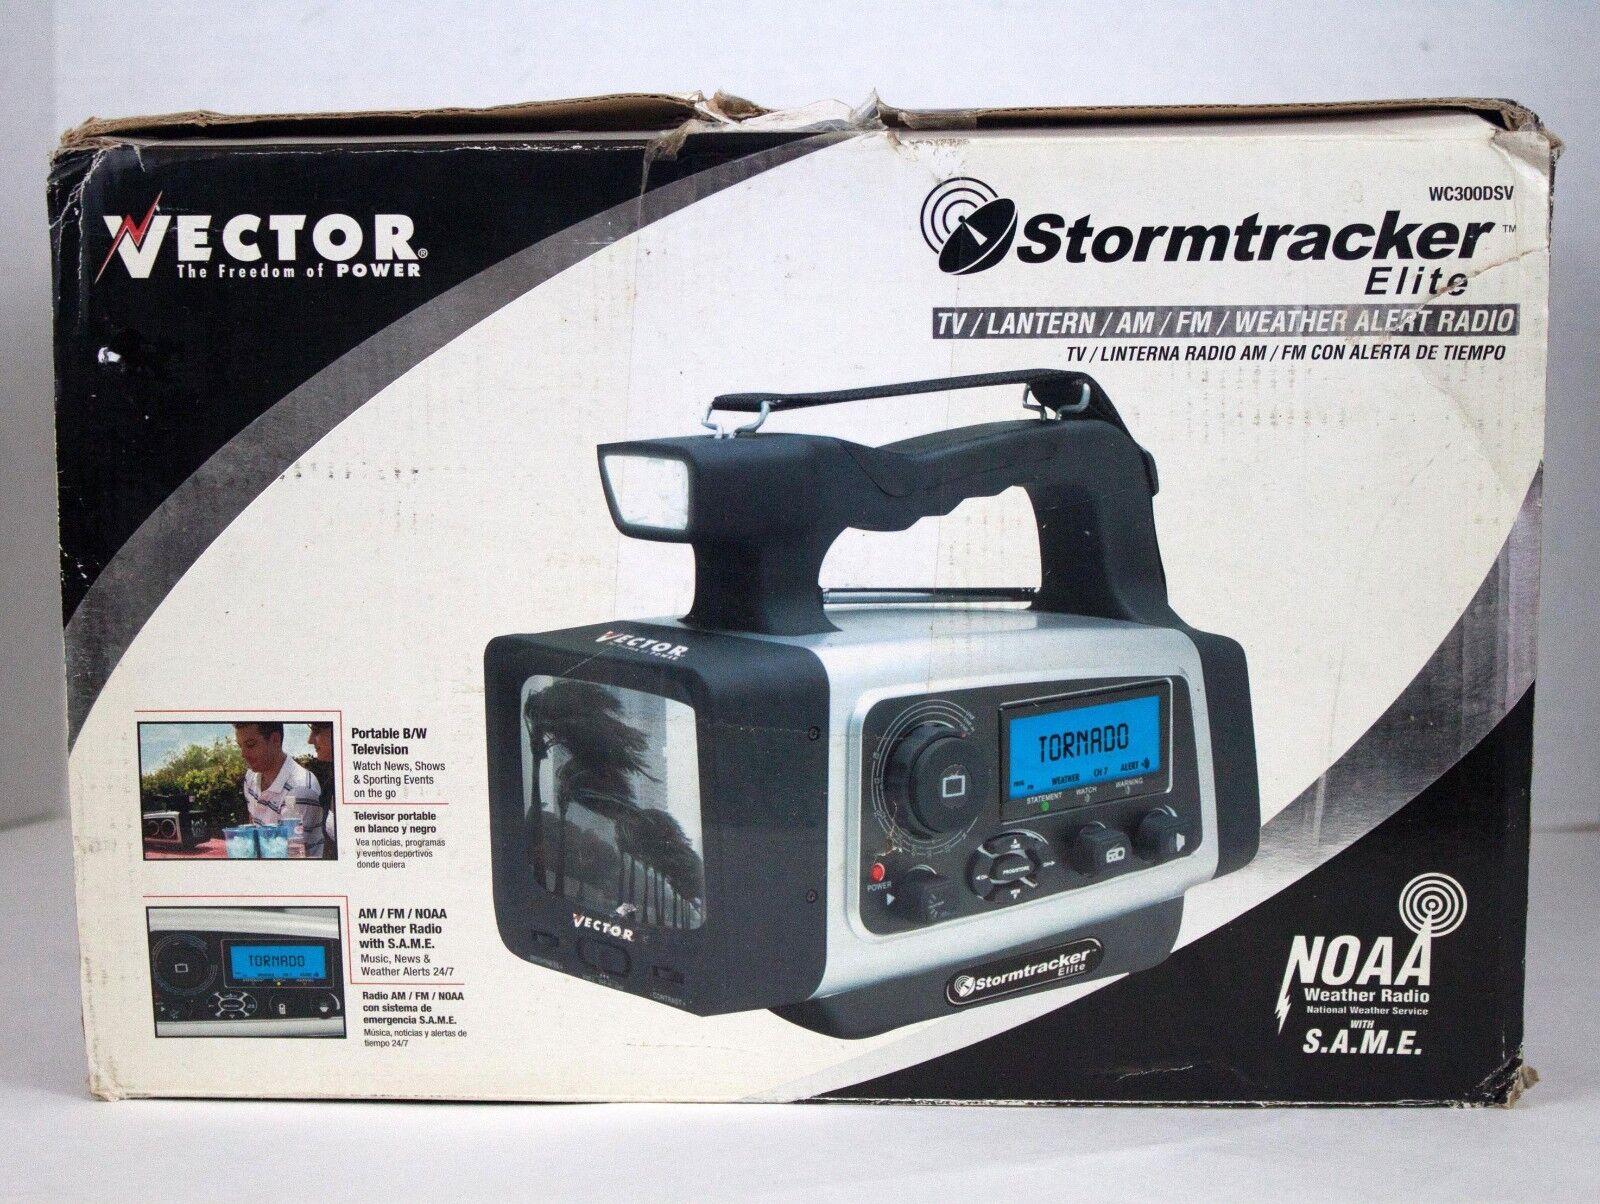 Vector Stormtracker Elite wc300dsv, TV, Latern, AM/FM Radio, Weather Alert Radio